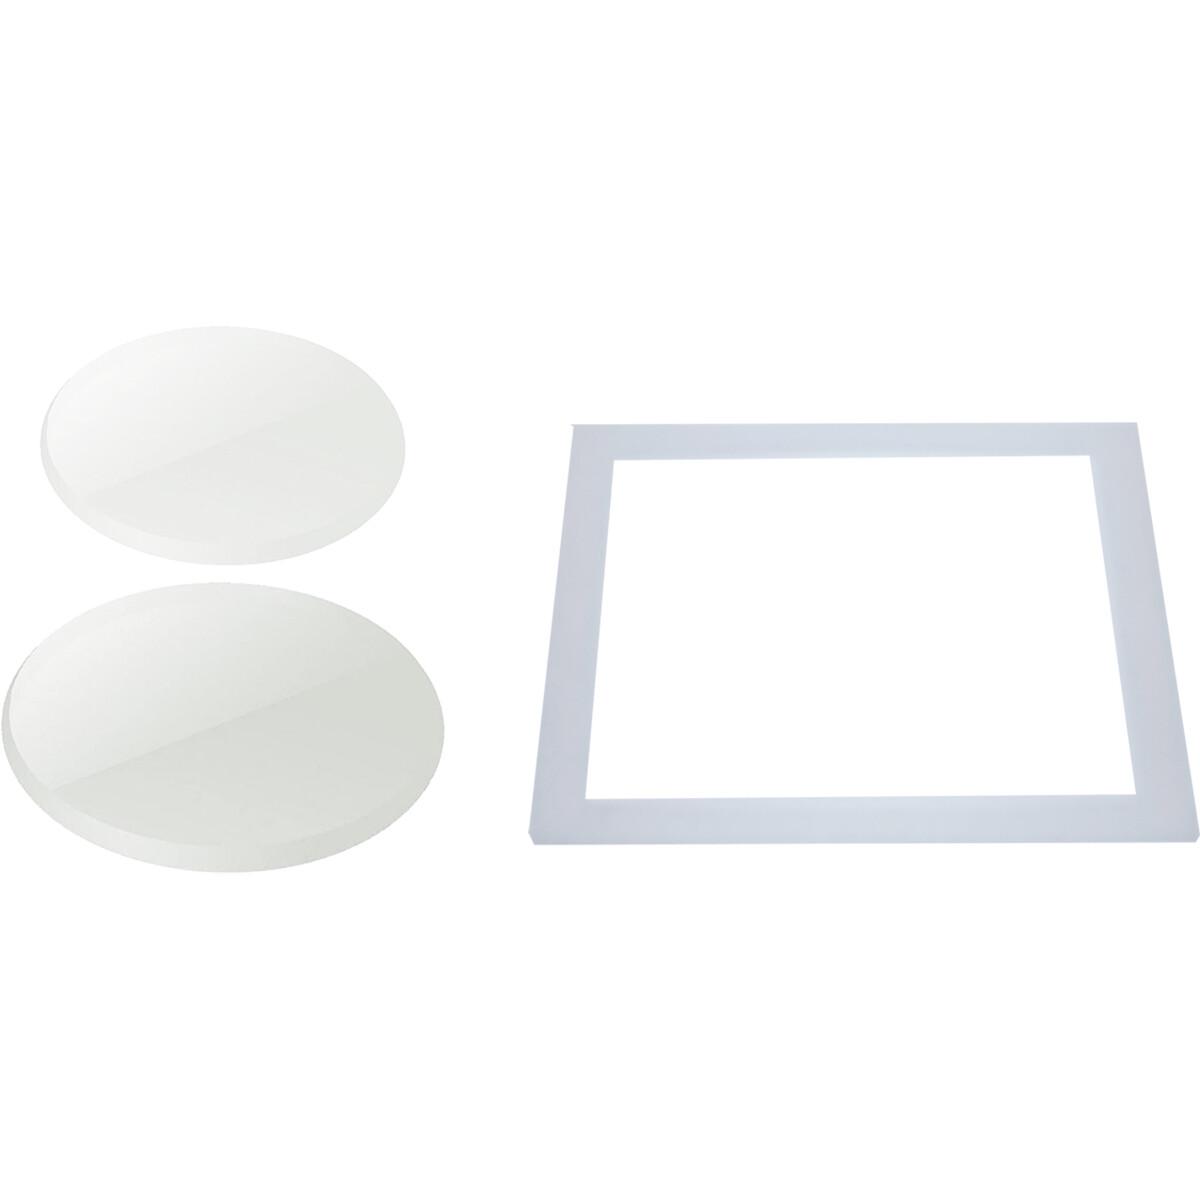 Spot IP65 Waterdicht Kit - Pragmi Weaty - Helder Glas - Melkglas - Vierkant